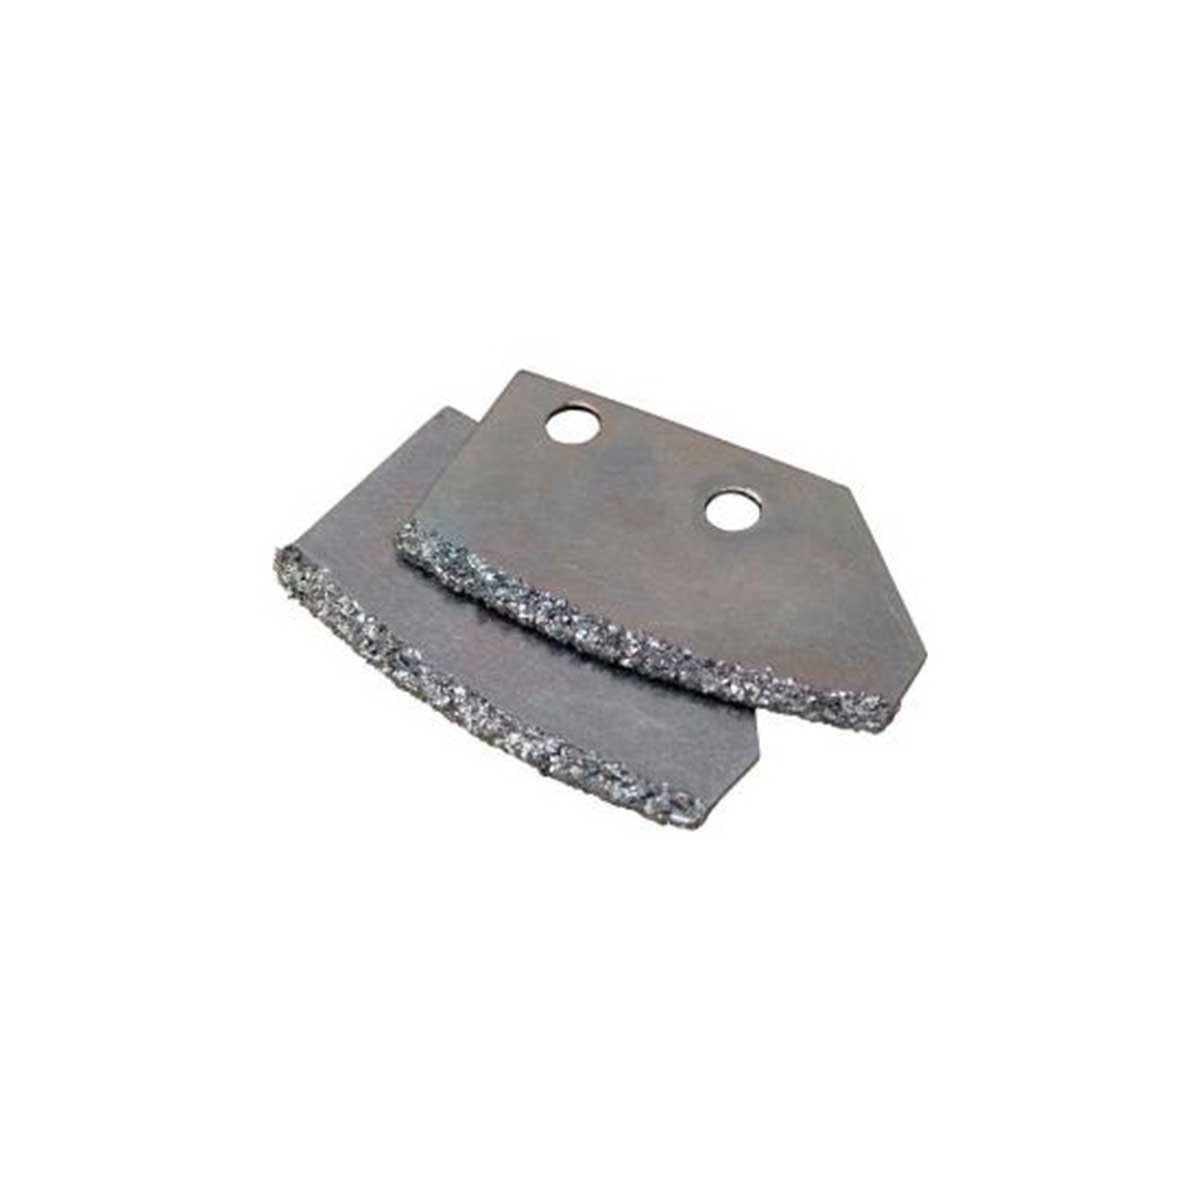 Carbide Grout Grabber Blade